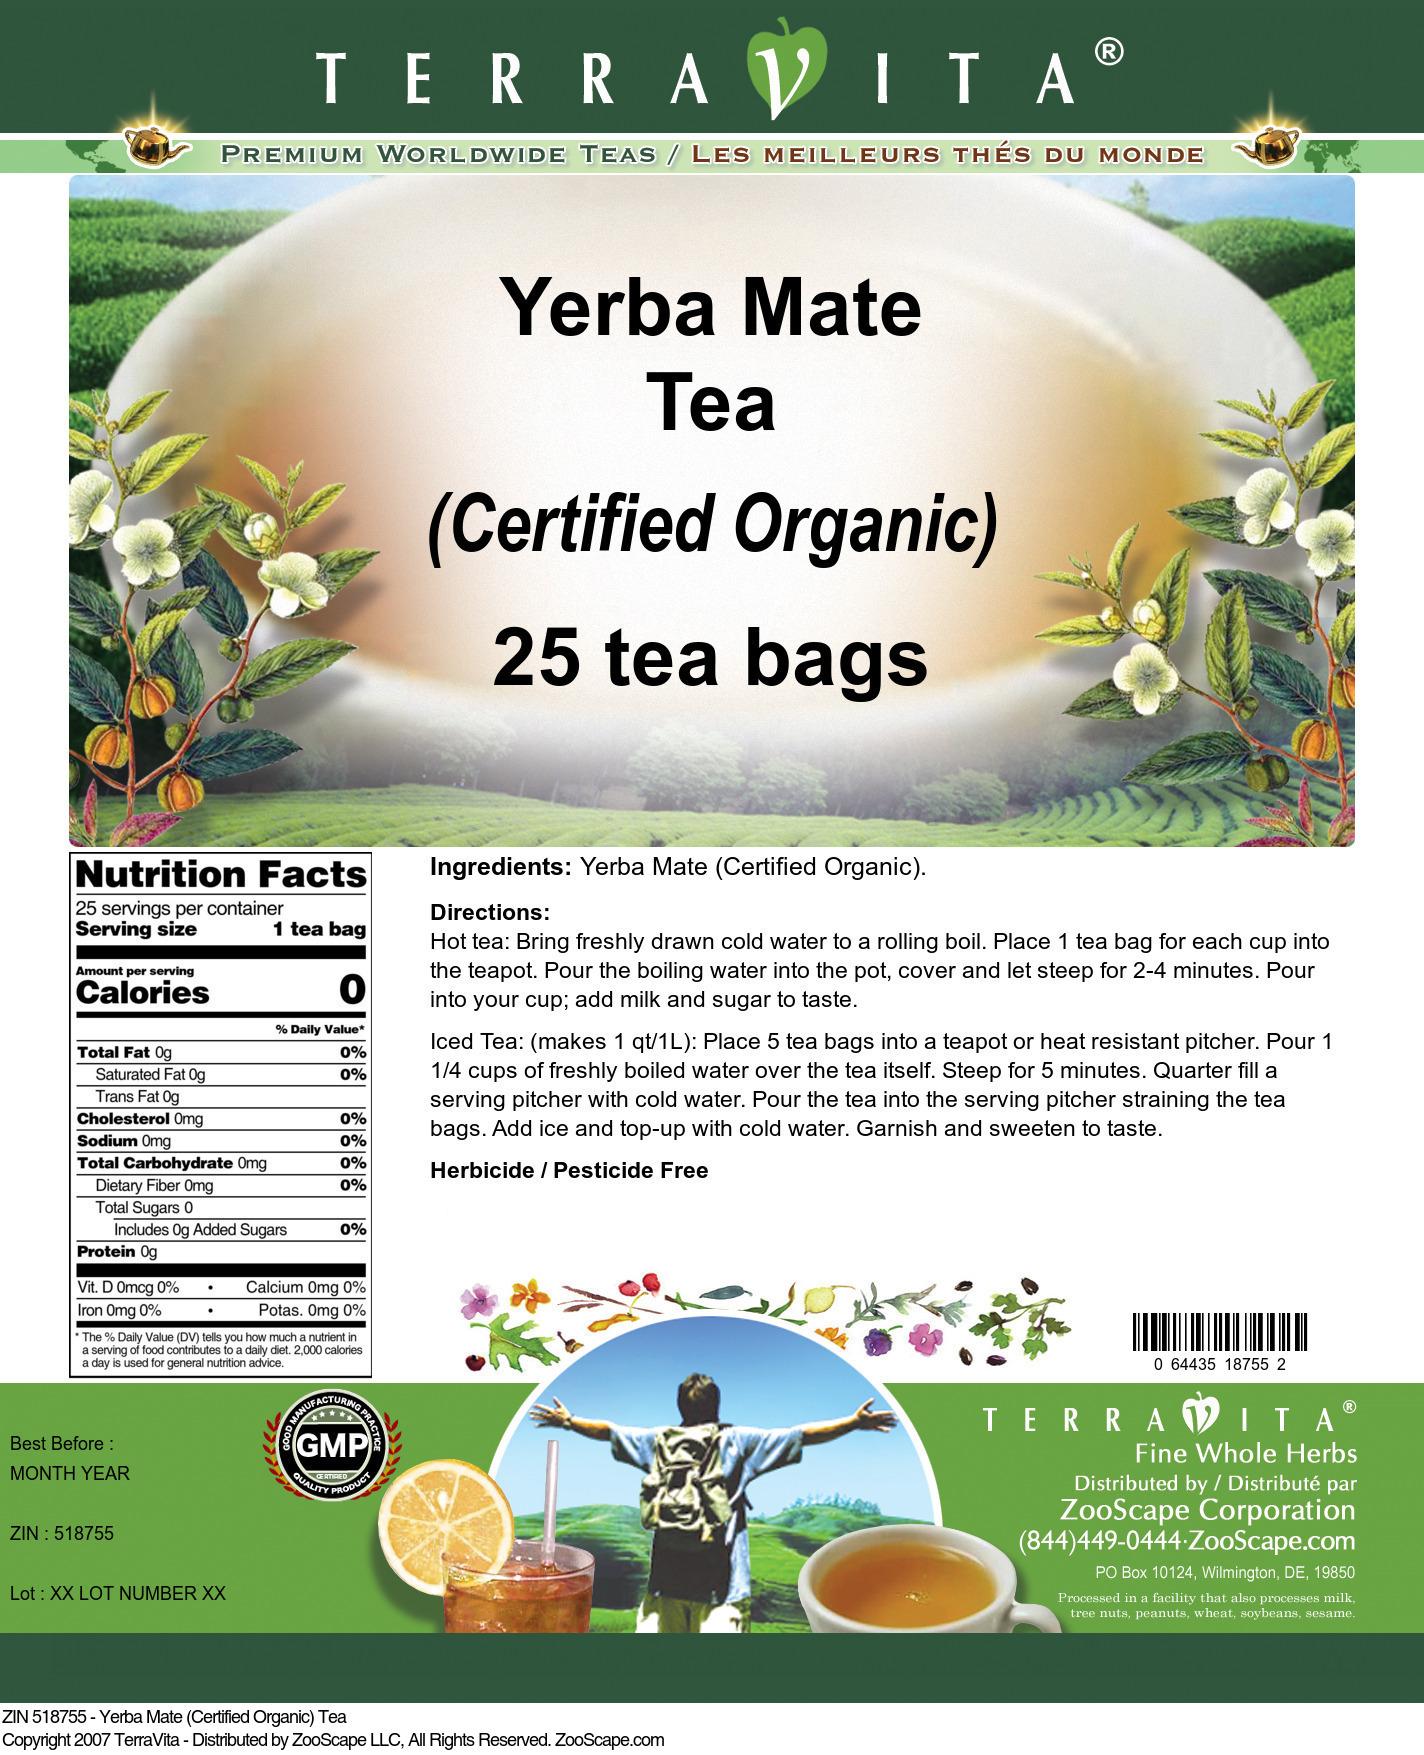 Yerba Mate (Certified Organic) Tea